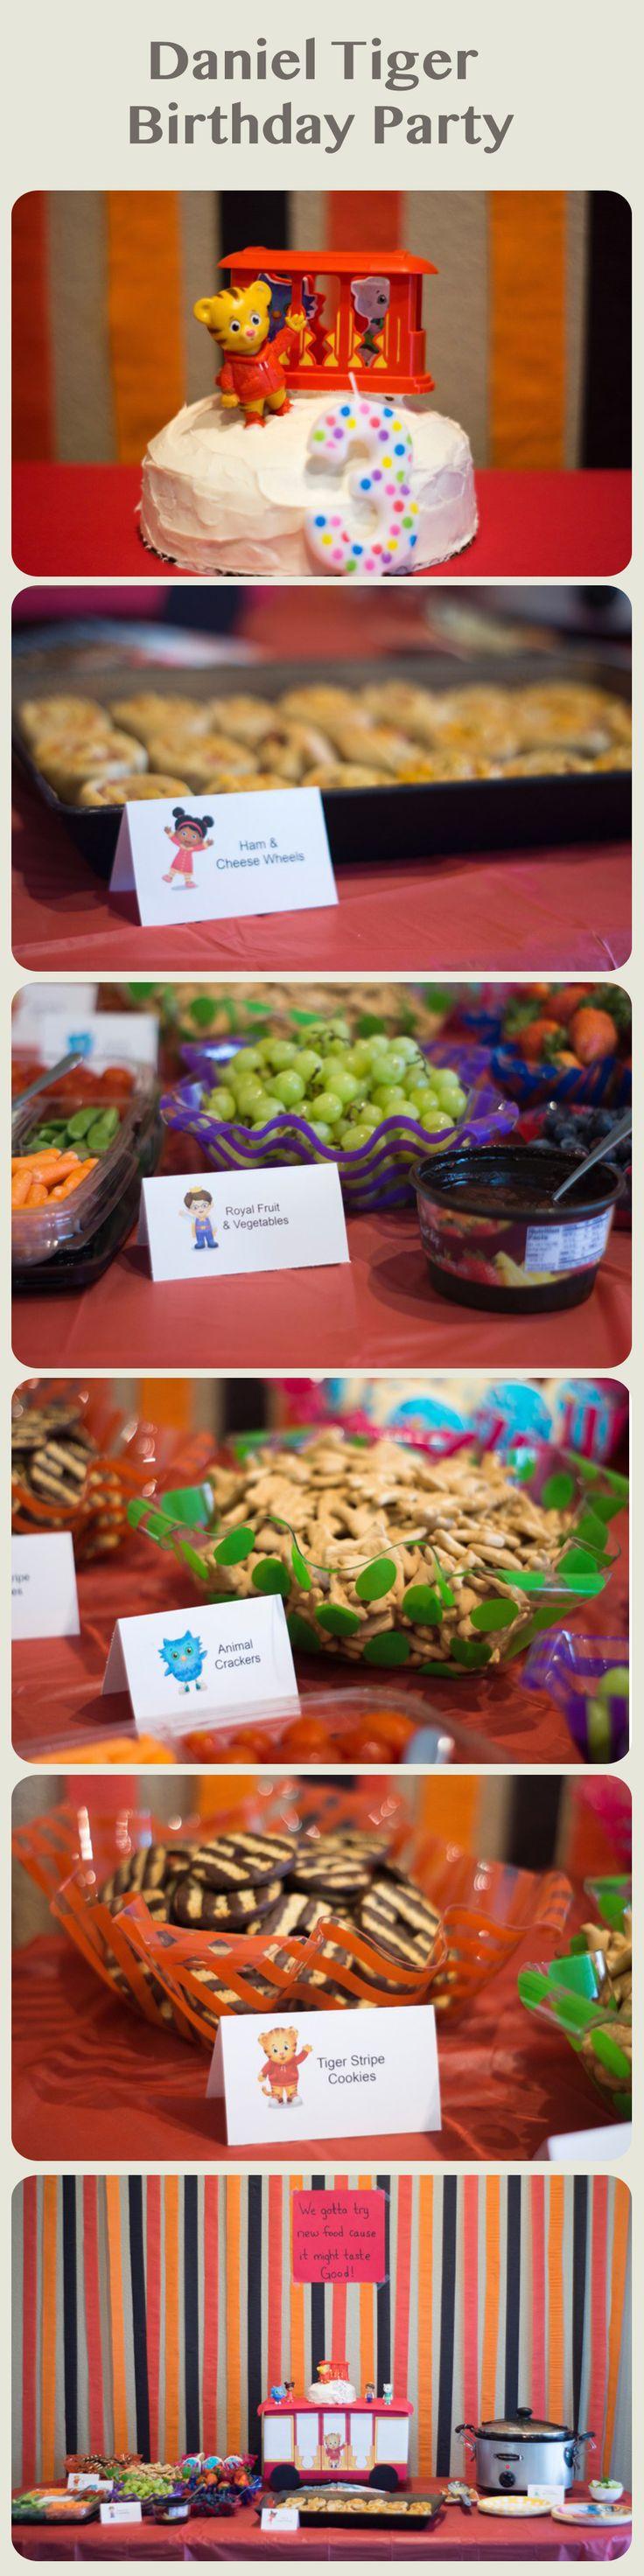 Daniel Tiger Birthday Party. DIY decorations. Food ideas. Trolley cake stand.